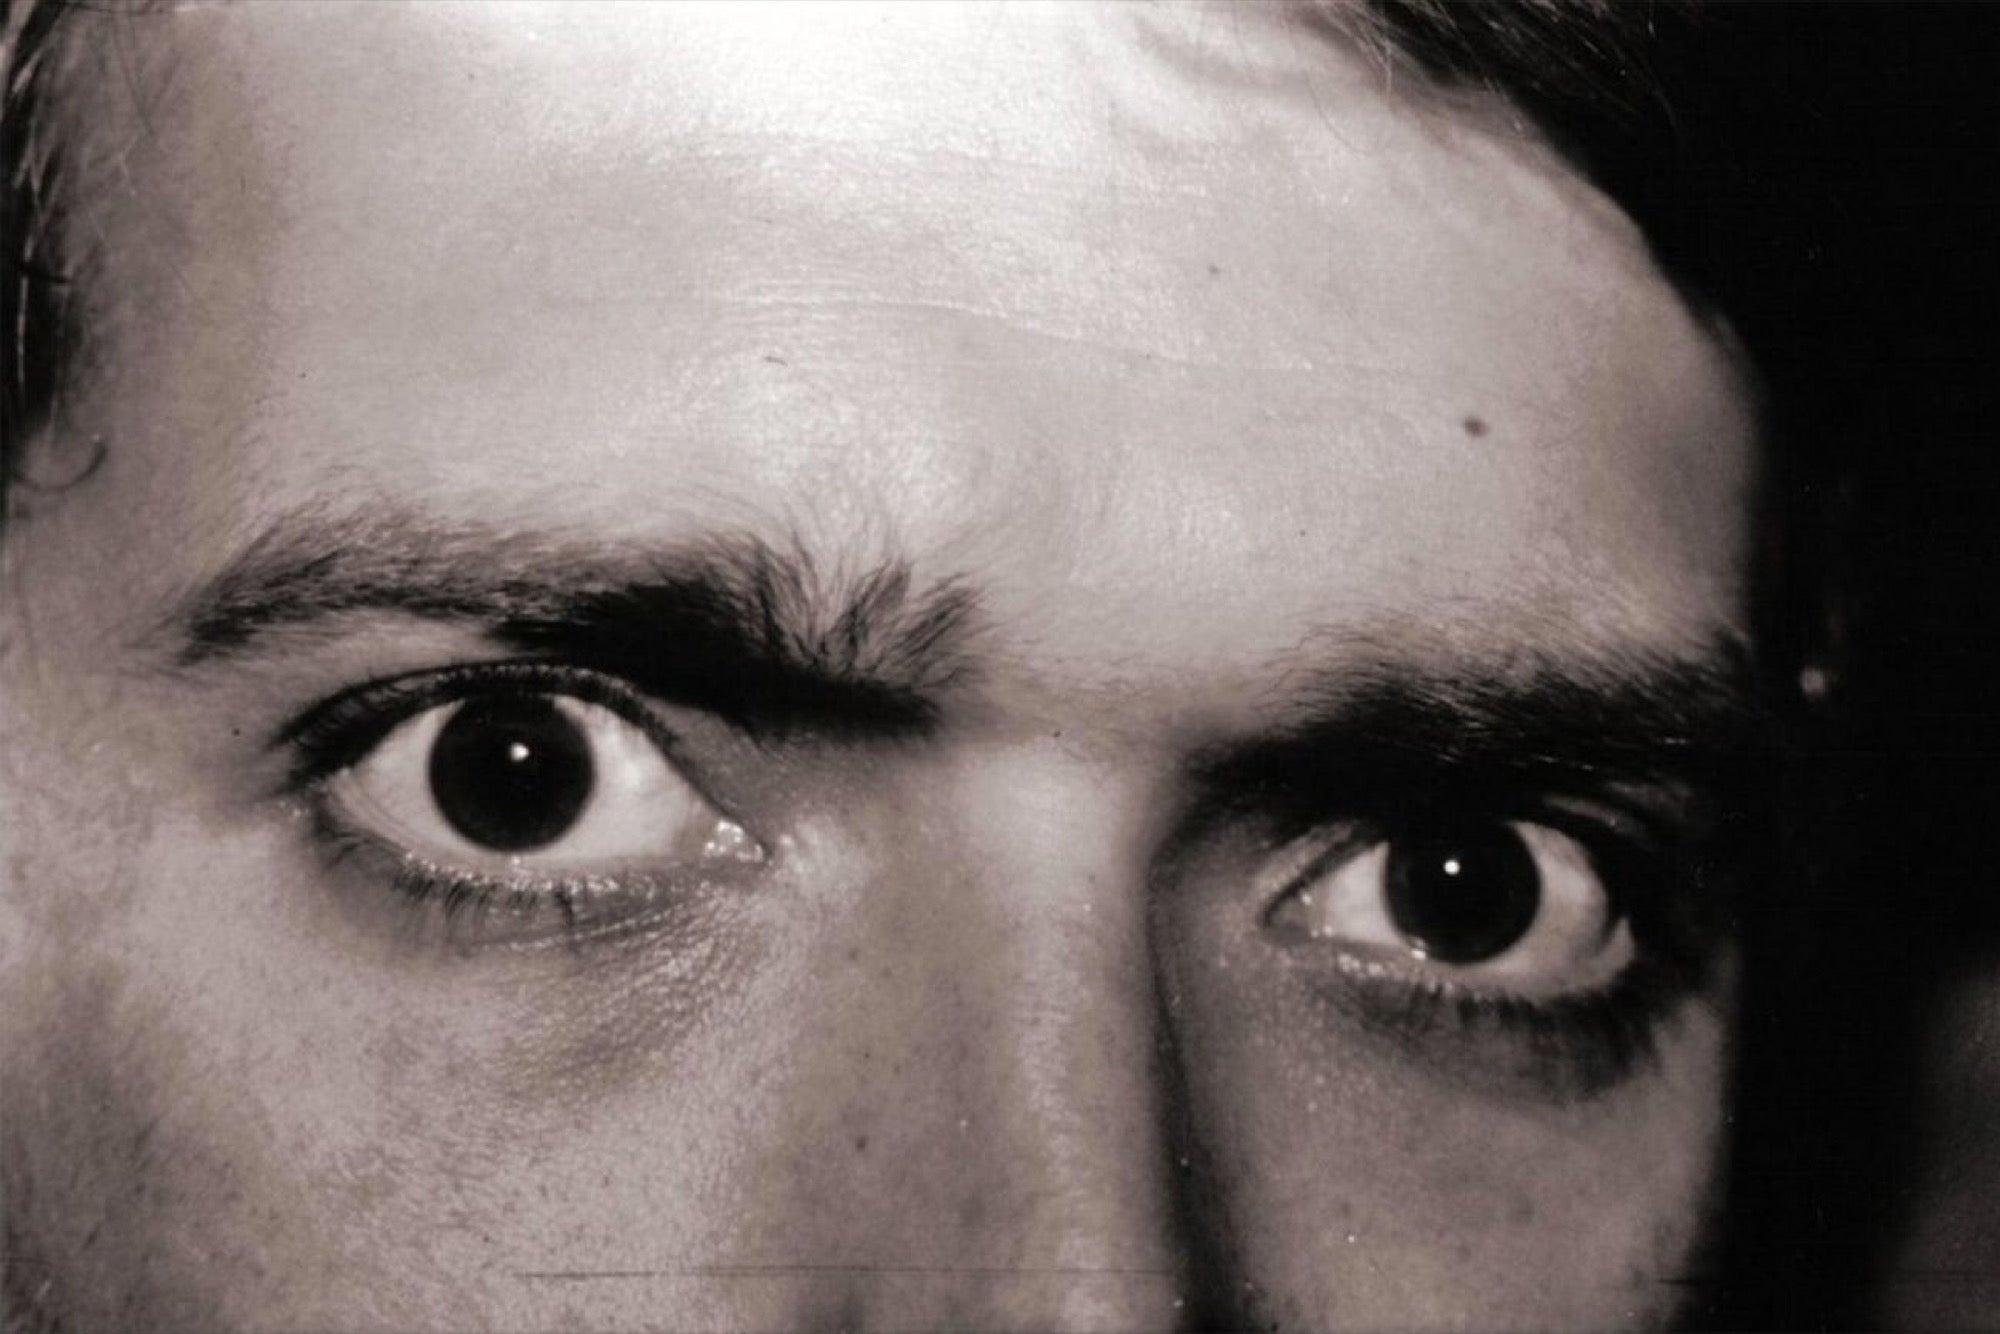 Green eyes intimidating people